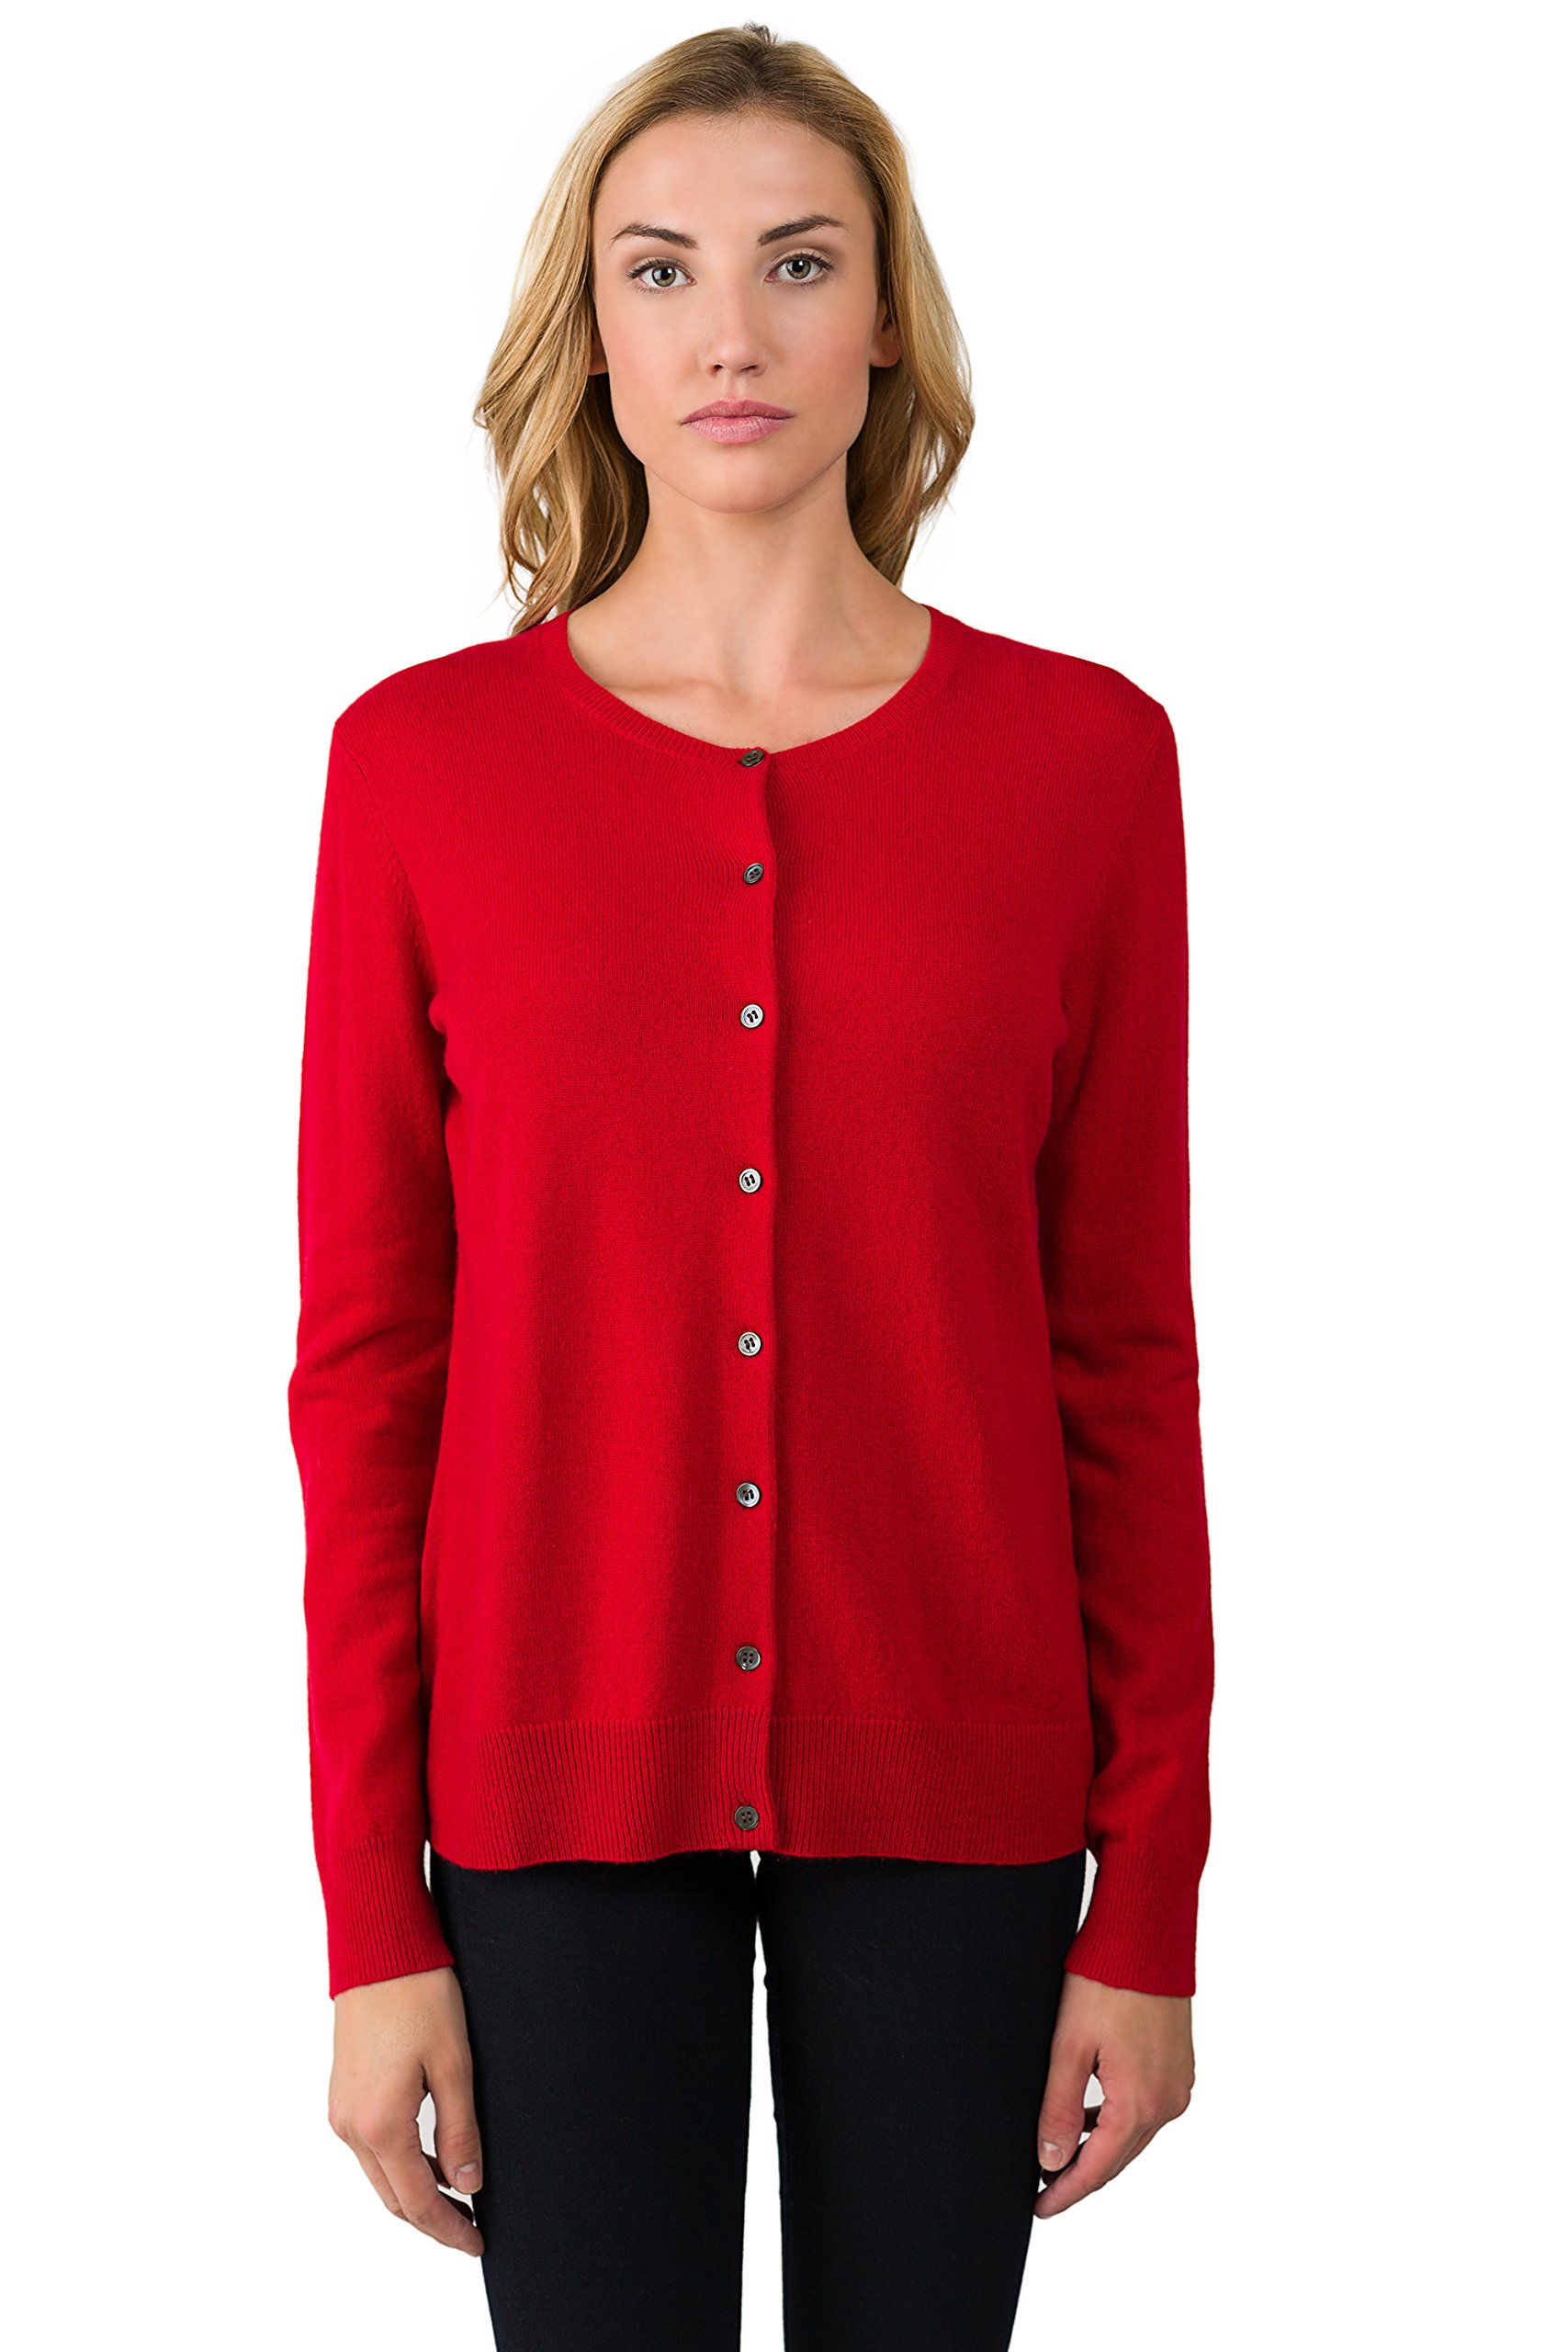 JENNIE LIU Women's 100% Cashmere Button Front Long Sleeve Crewneck Cardigan Sweater (L, RED)